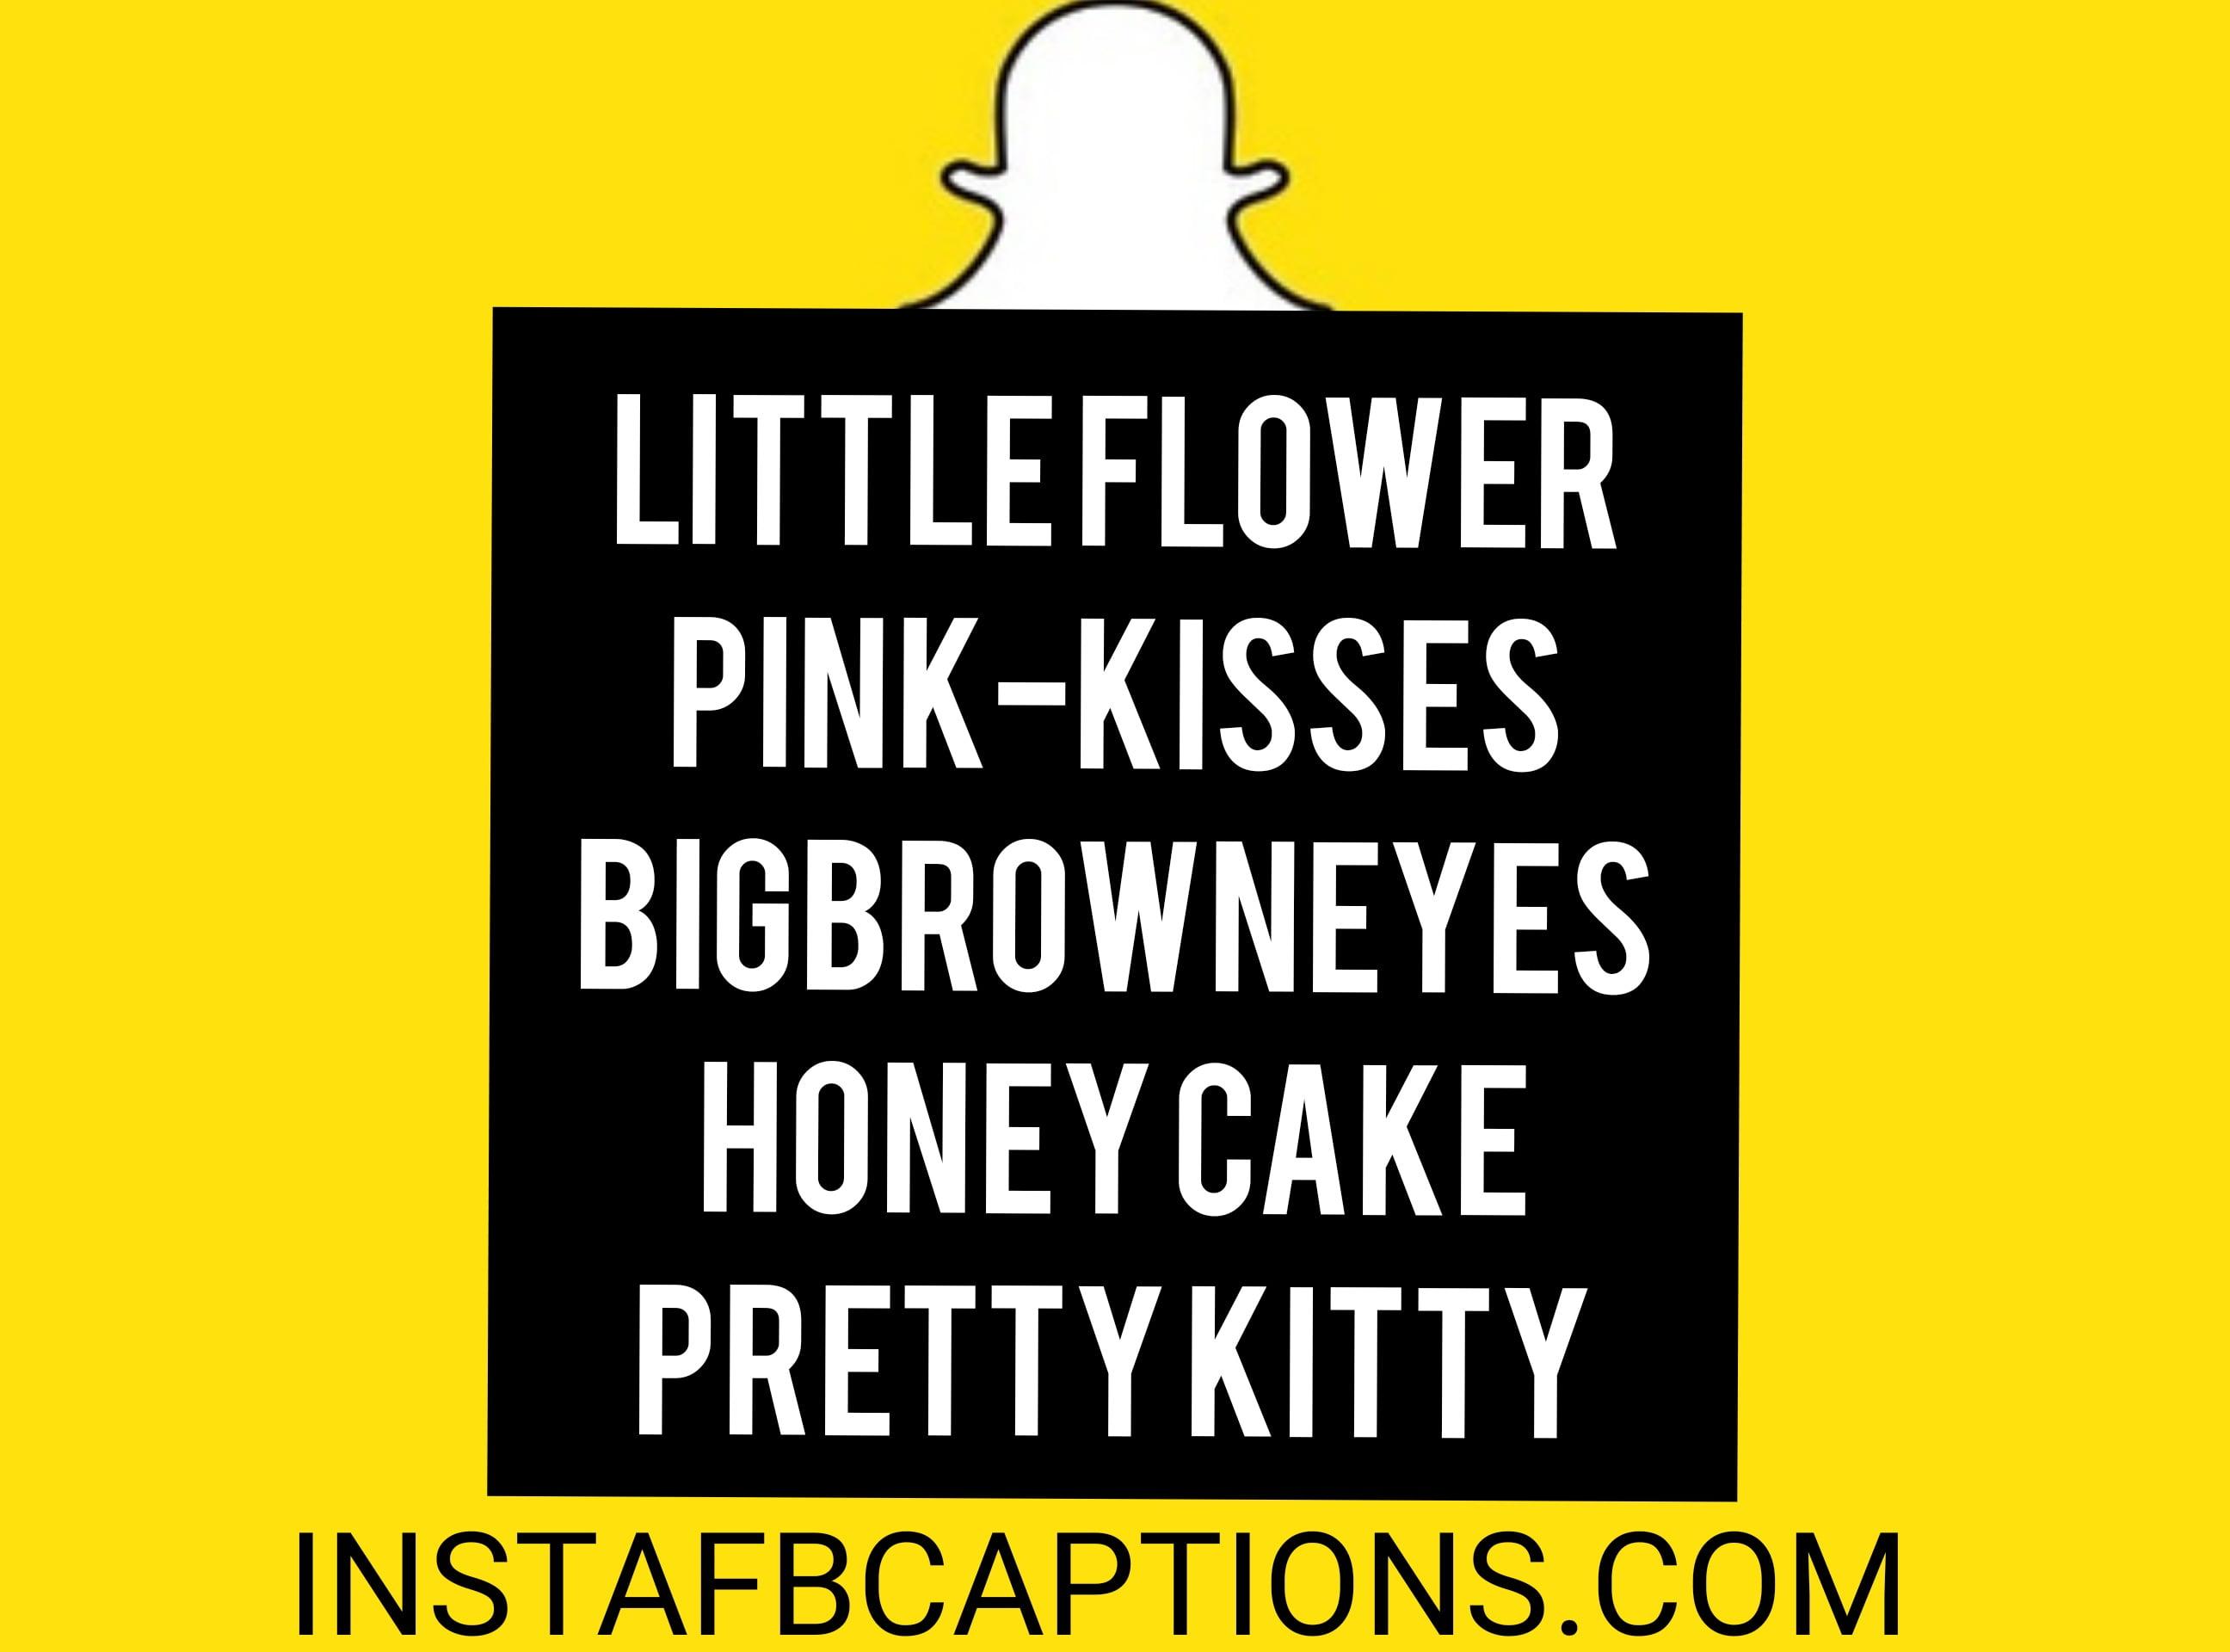 Snapchat Names For Girls  - Snapchat names for girls - 750+ Best SNAPCHAT NAME IDEAS for Guys & Girls 2021